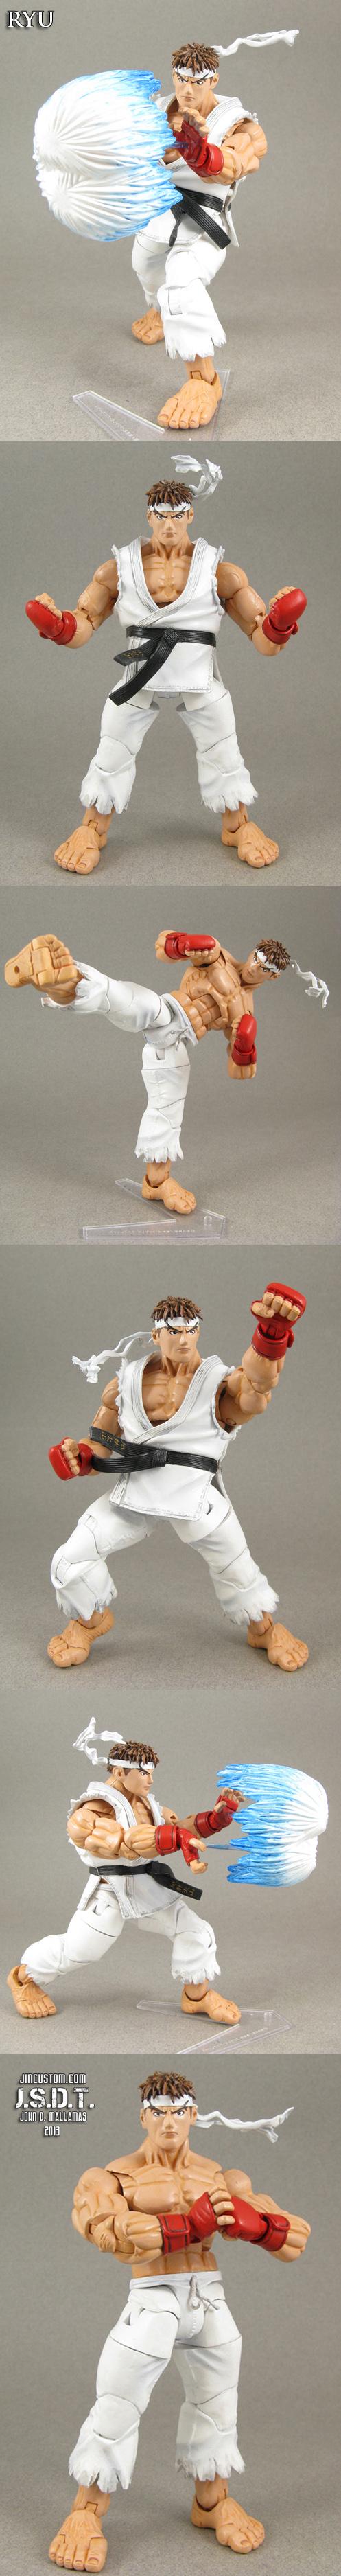 Street Fighter Alpha Ryu custom figure by Jin-Saotome